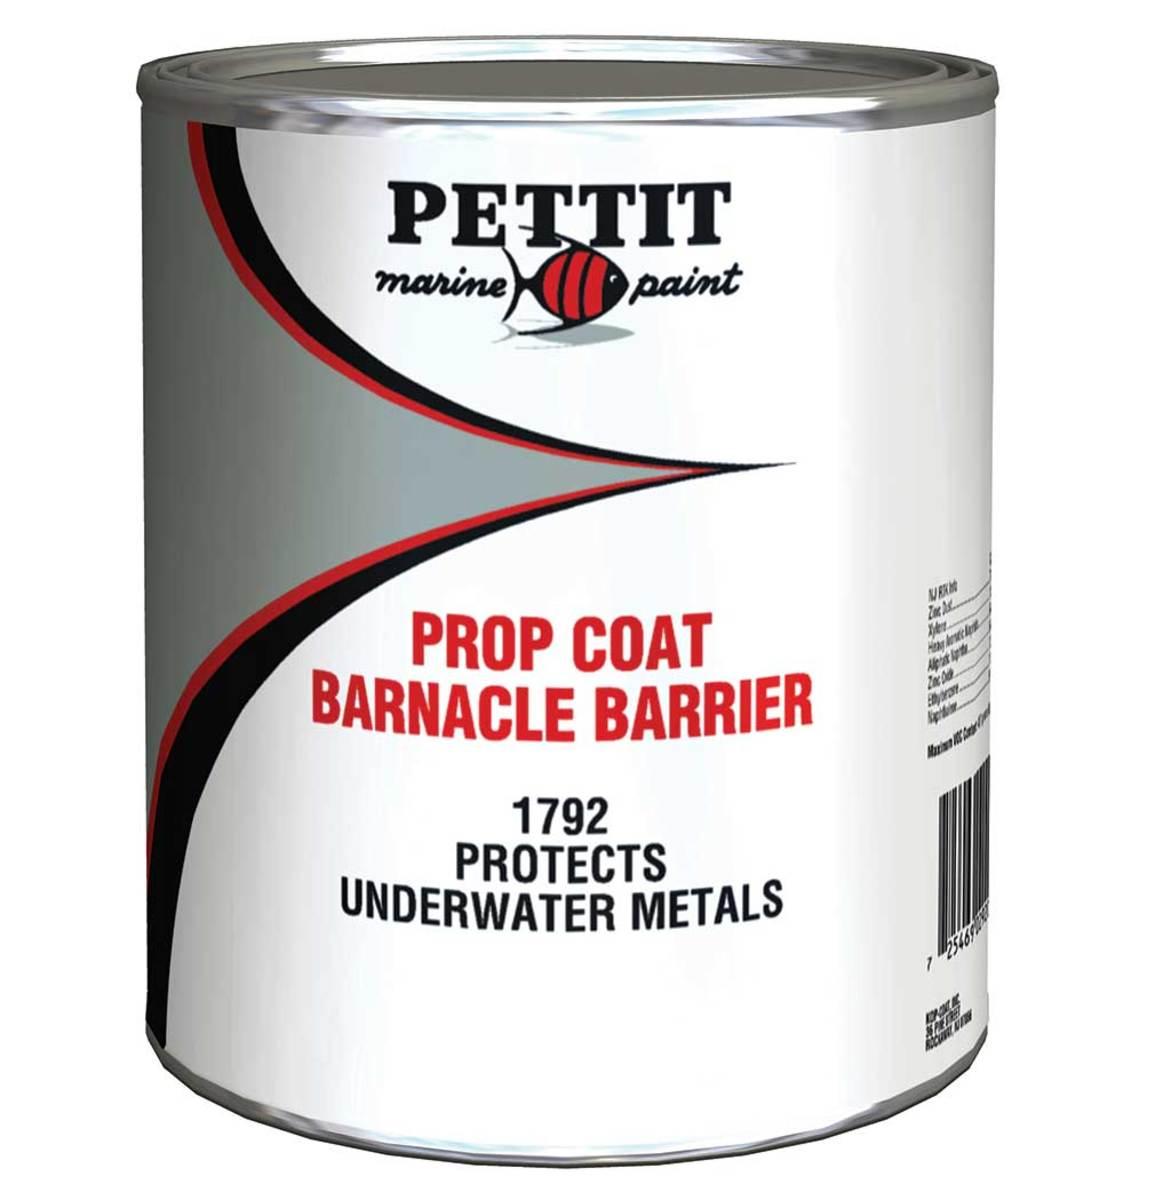 Prop-Coat-Barnacle-Barrier-Quart-No-Background